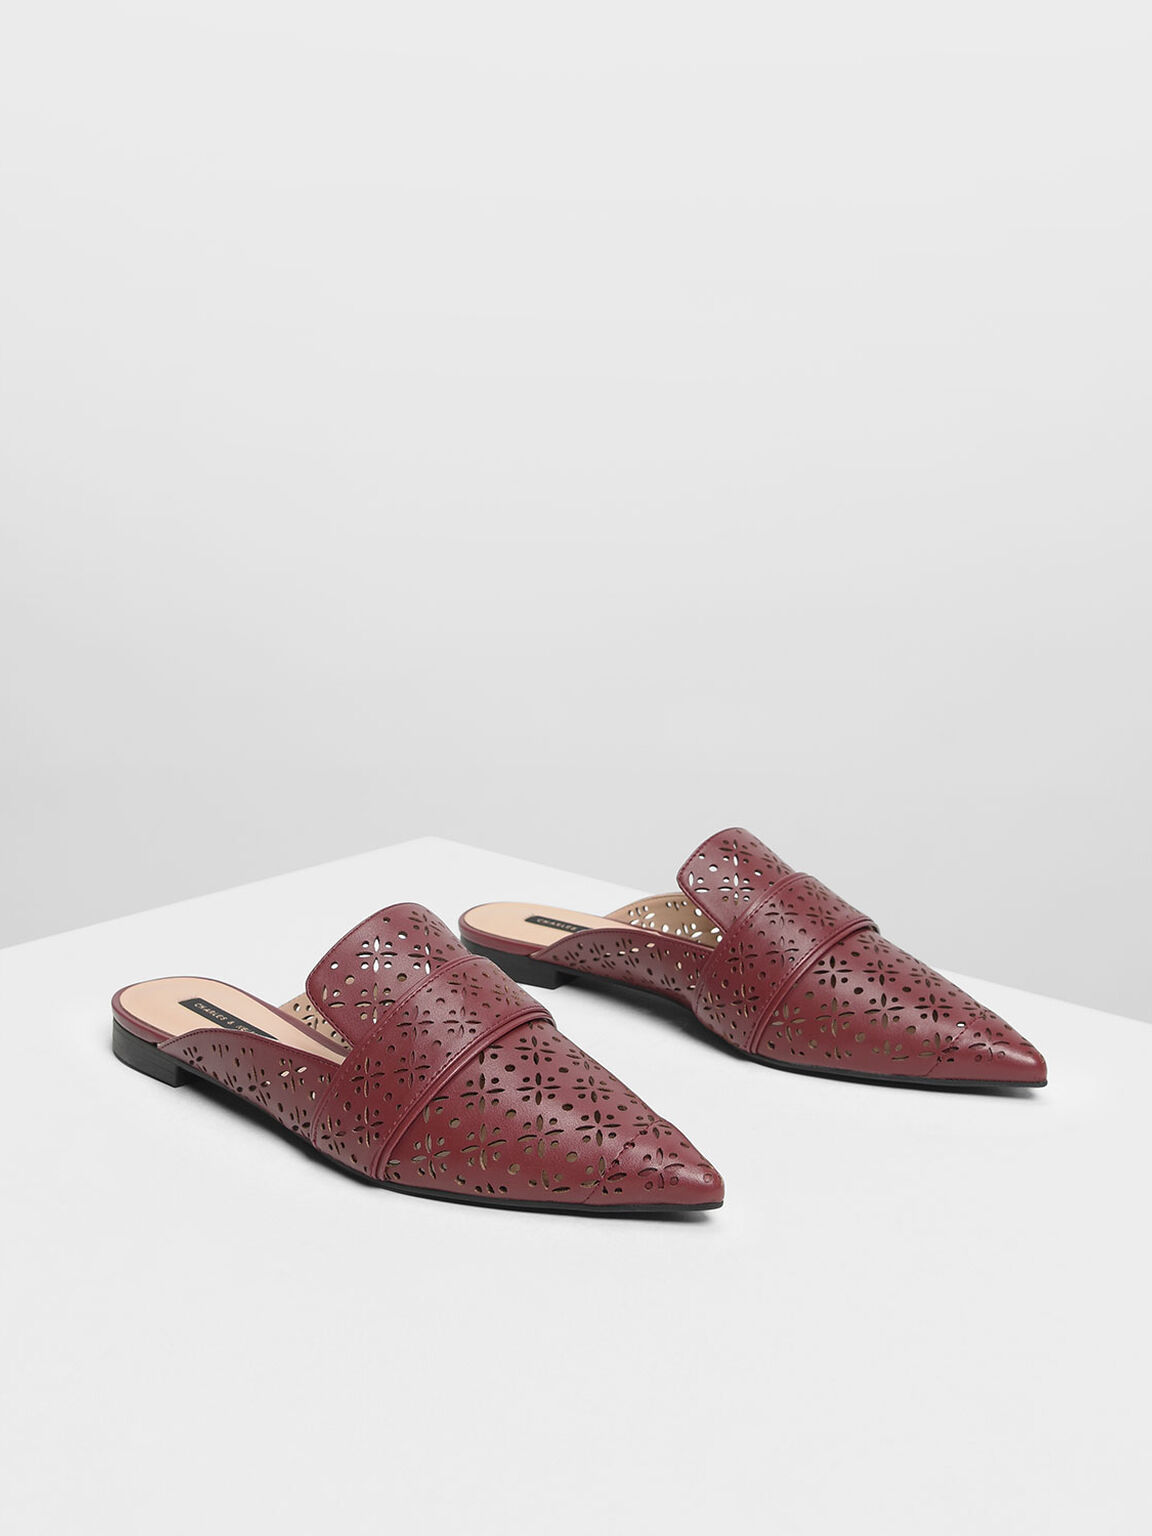 Motif Pointed Toe Mules, Burgundy, hi-res